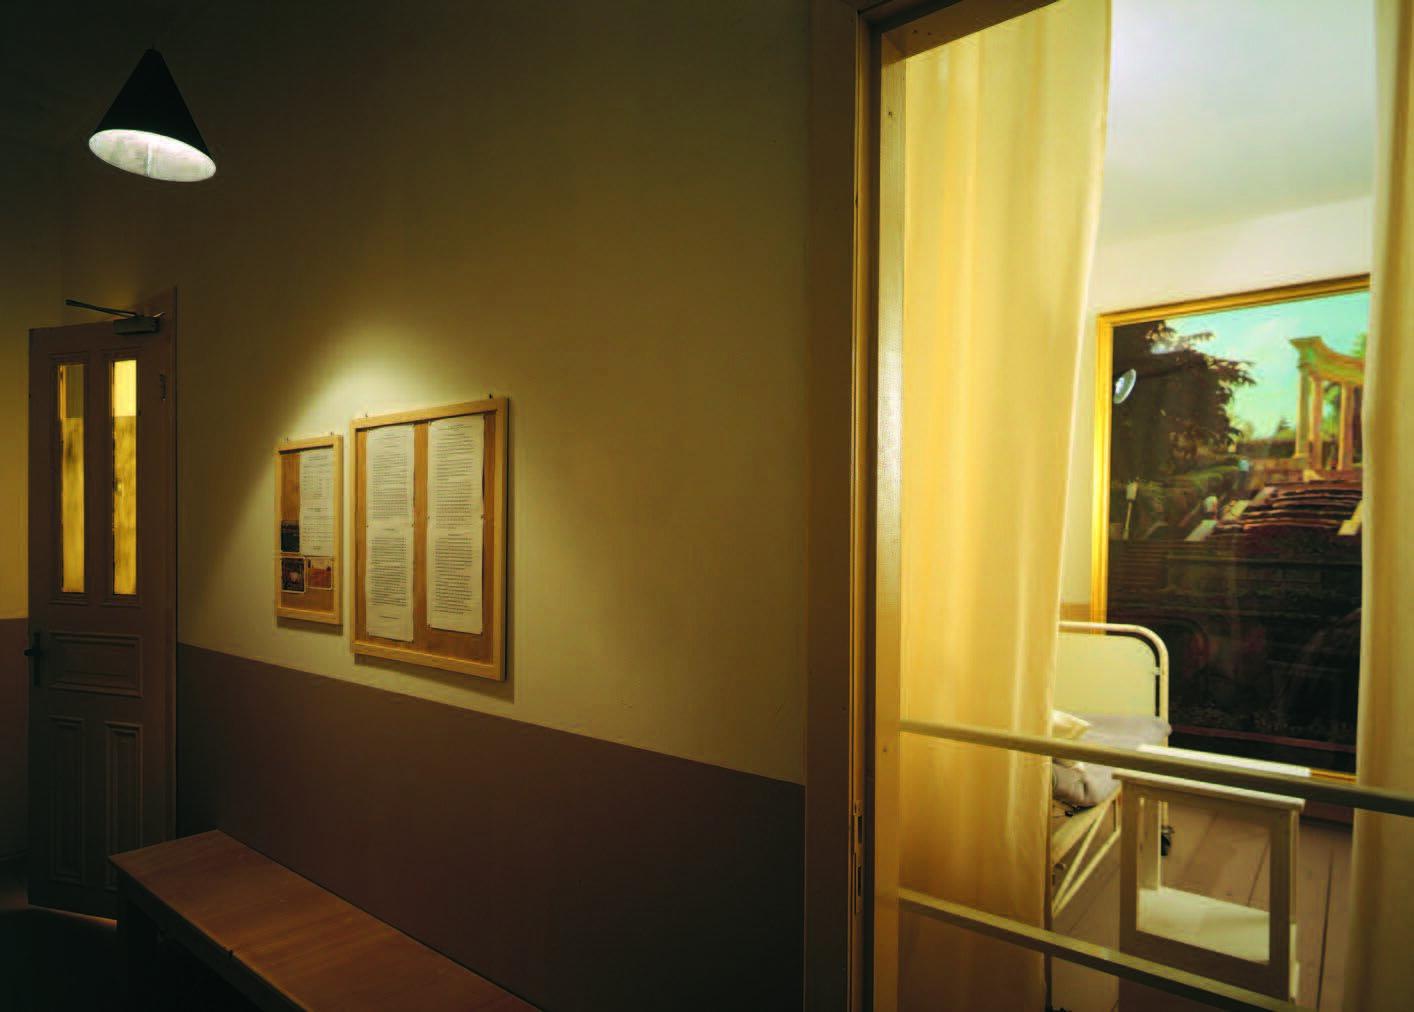 View-of-installation-Hamburger-Kunst-halle-Hamburg-1996-Photo-by-Elke-Walford.jpg